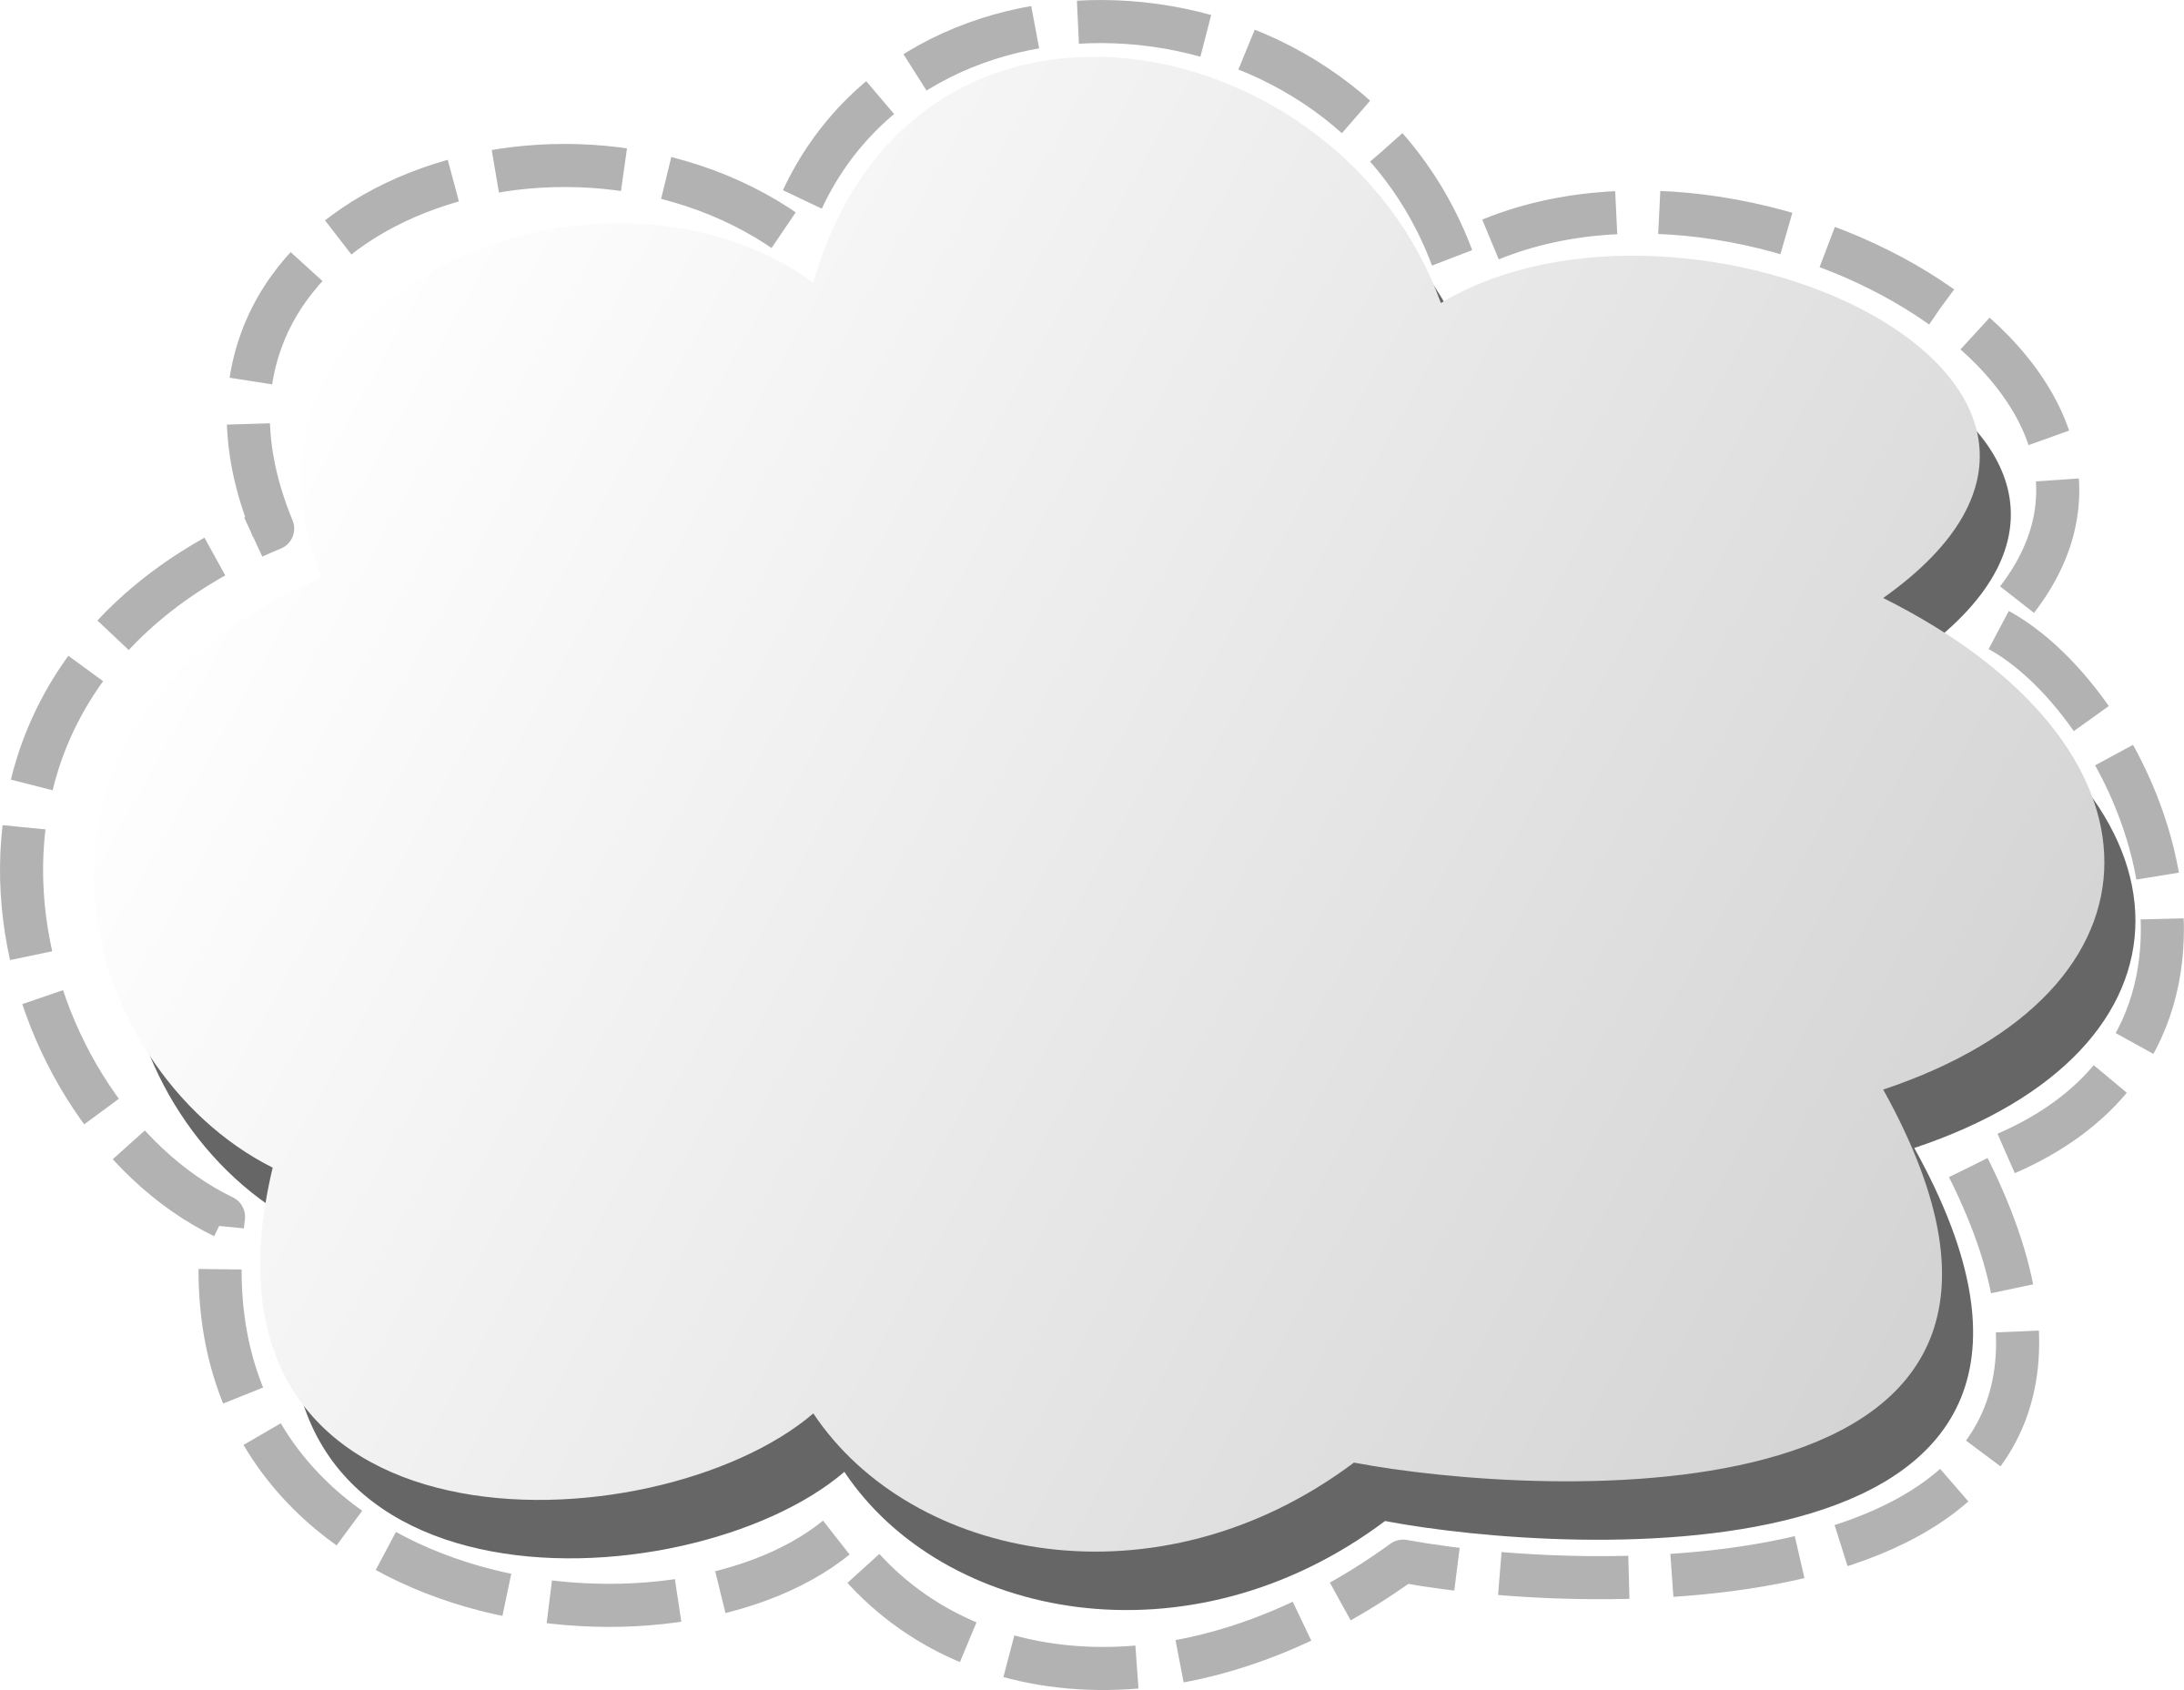 Clouds clipart cute. Cloud big image png